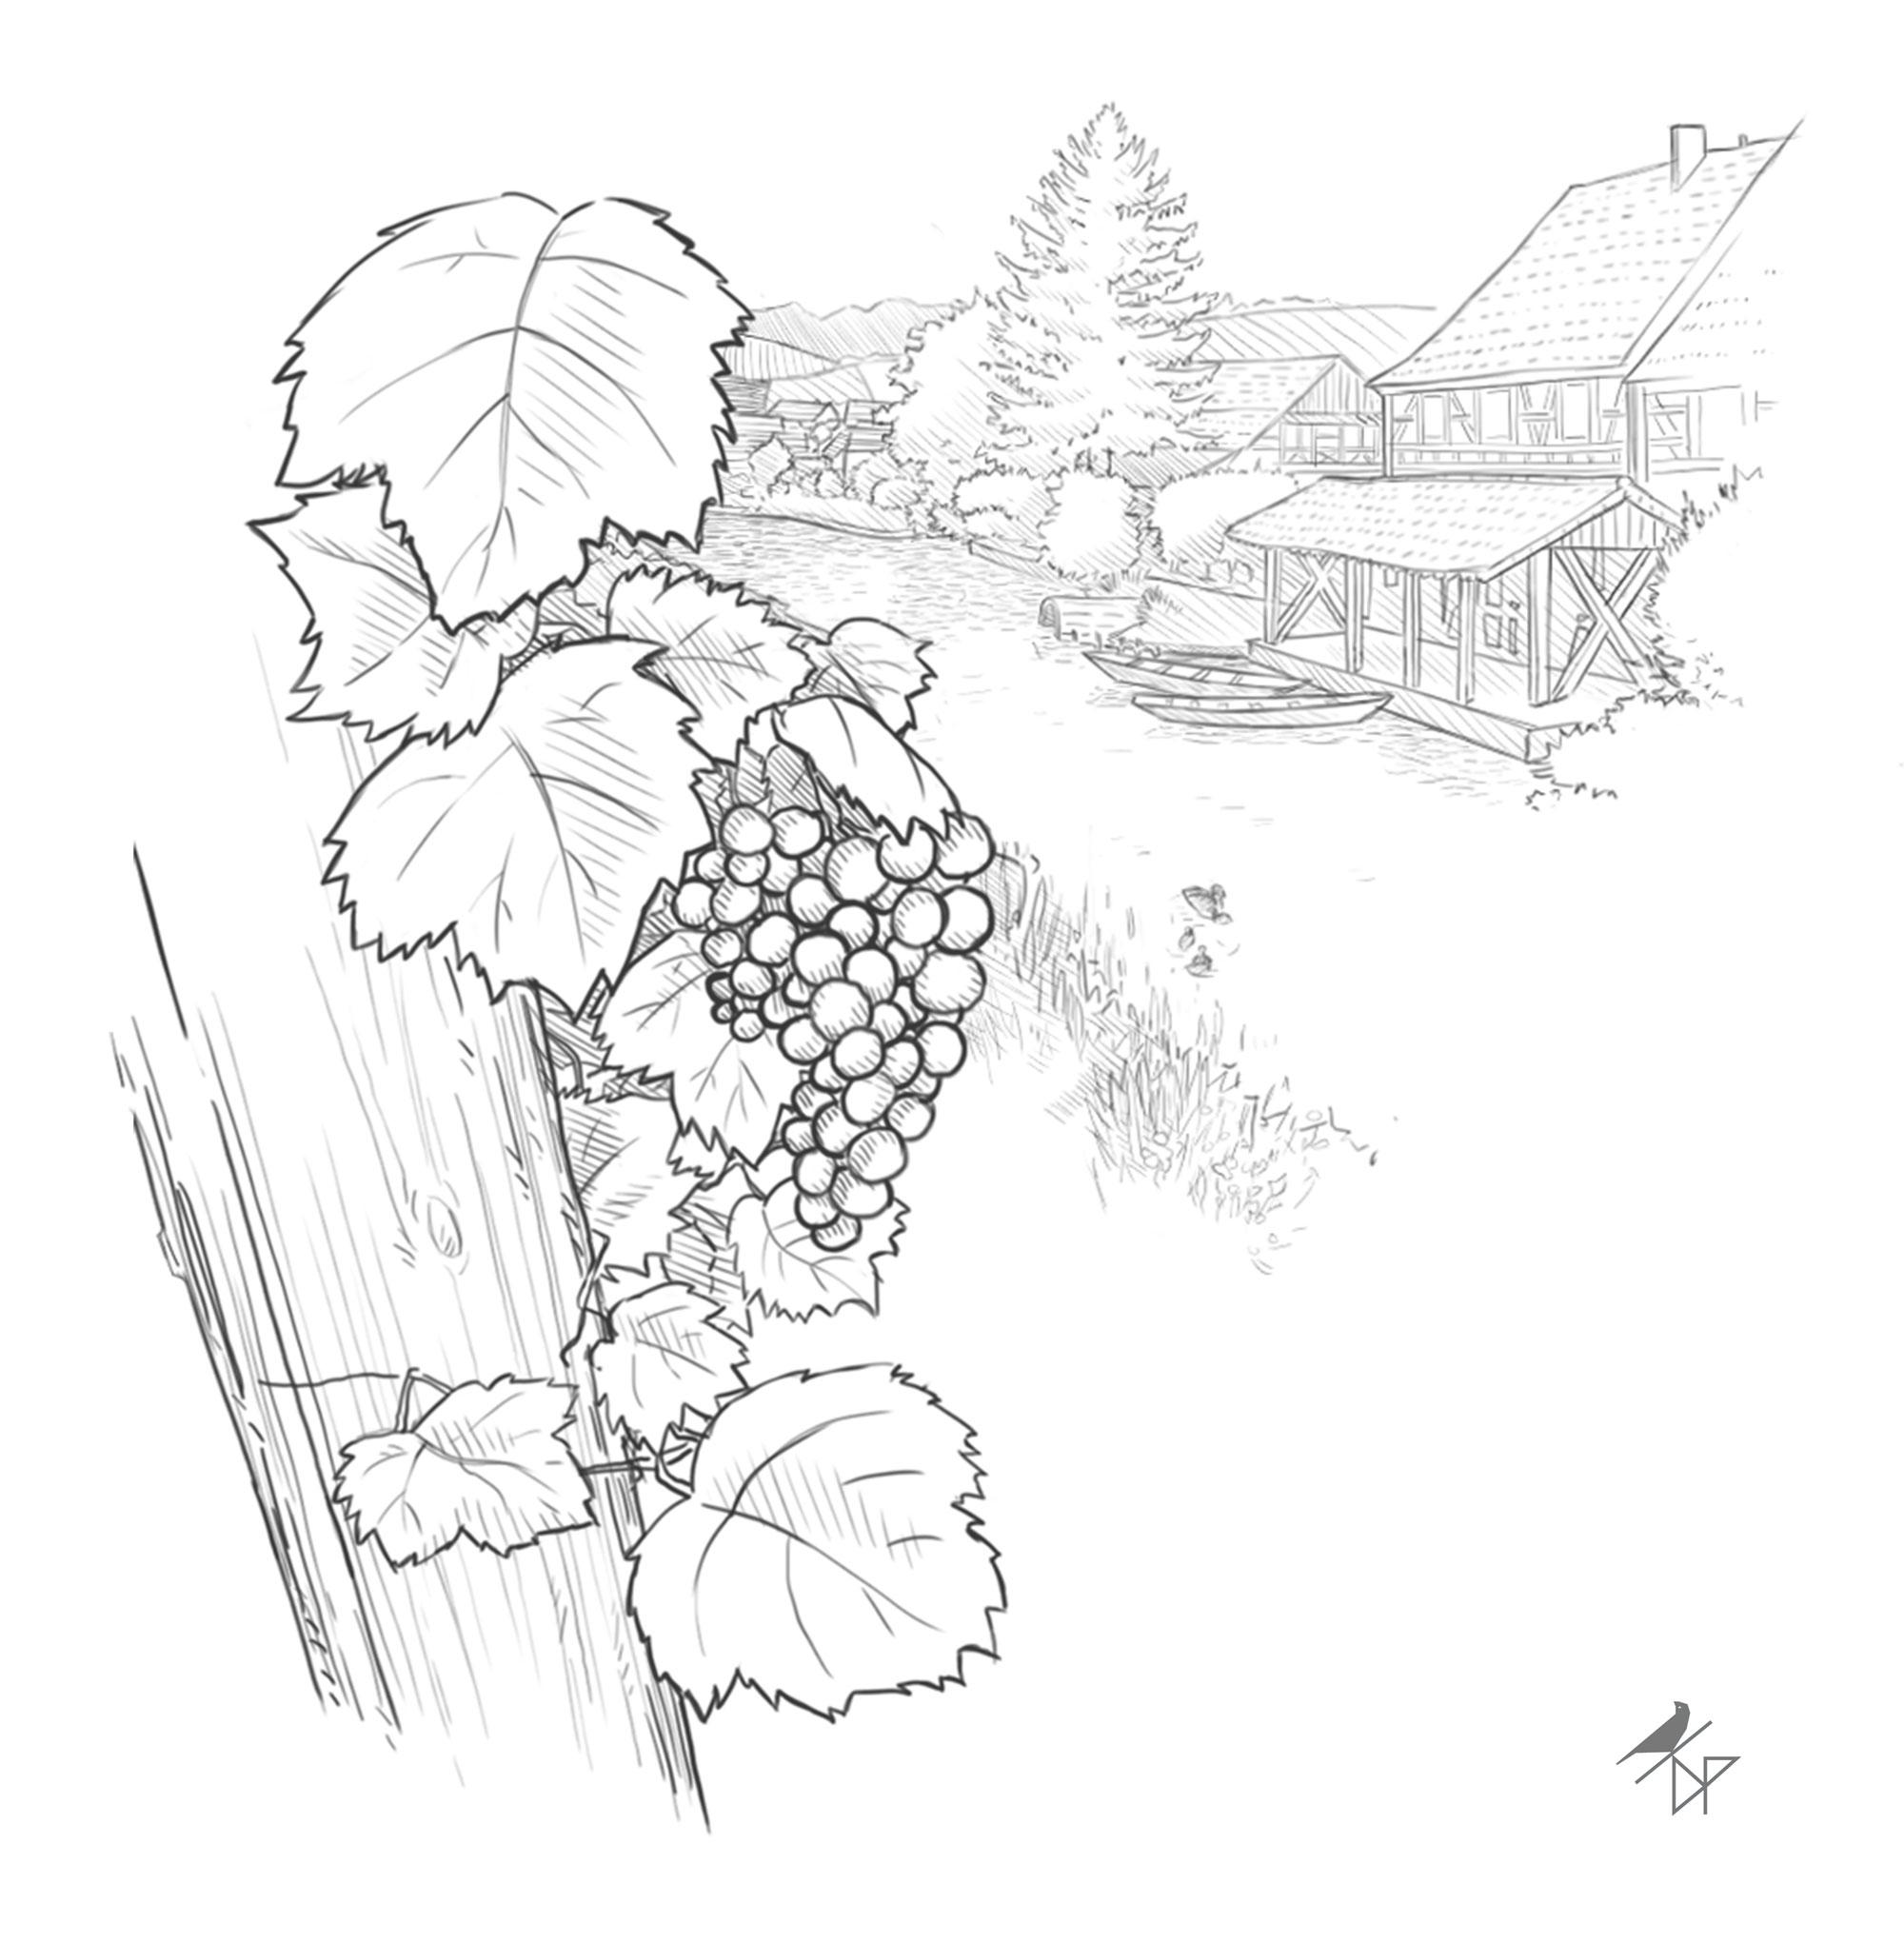 damien pons strasbourg illustrateur vin vignoble oenotoursime